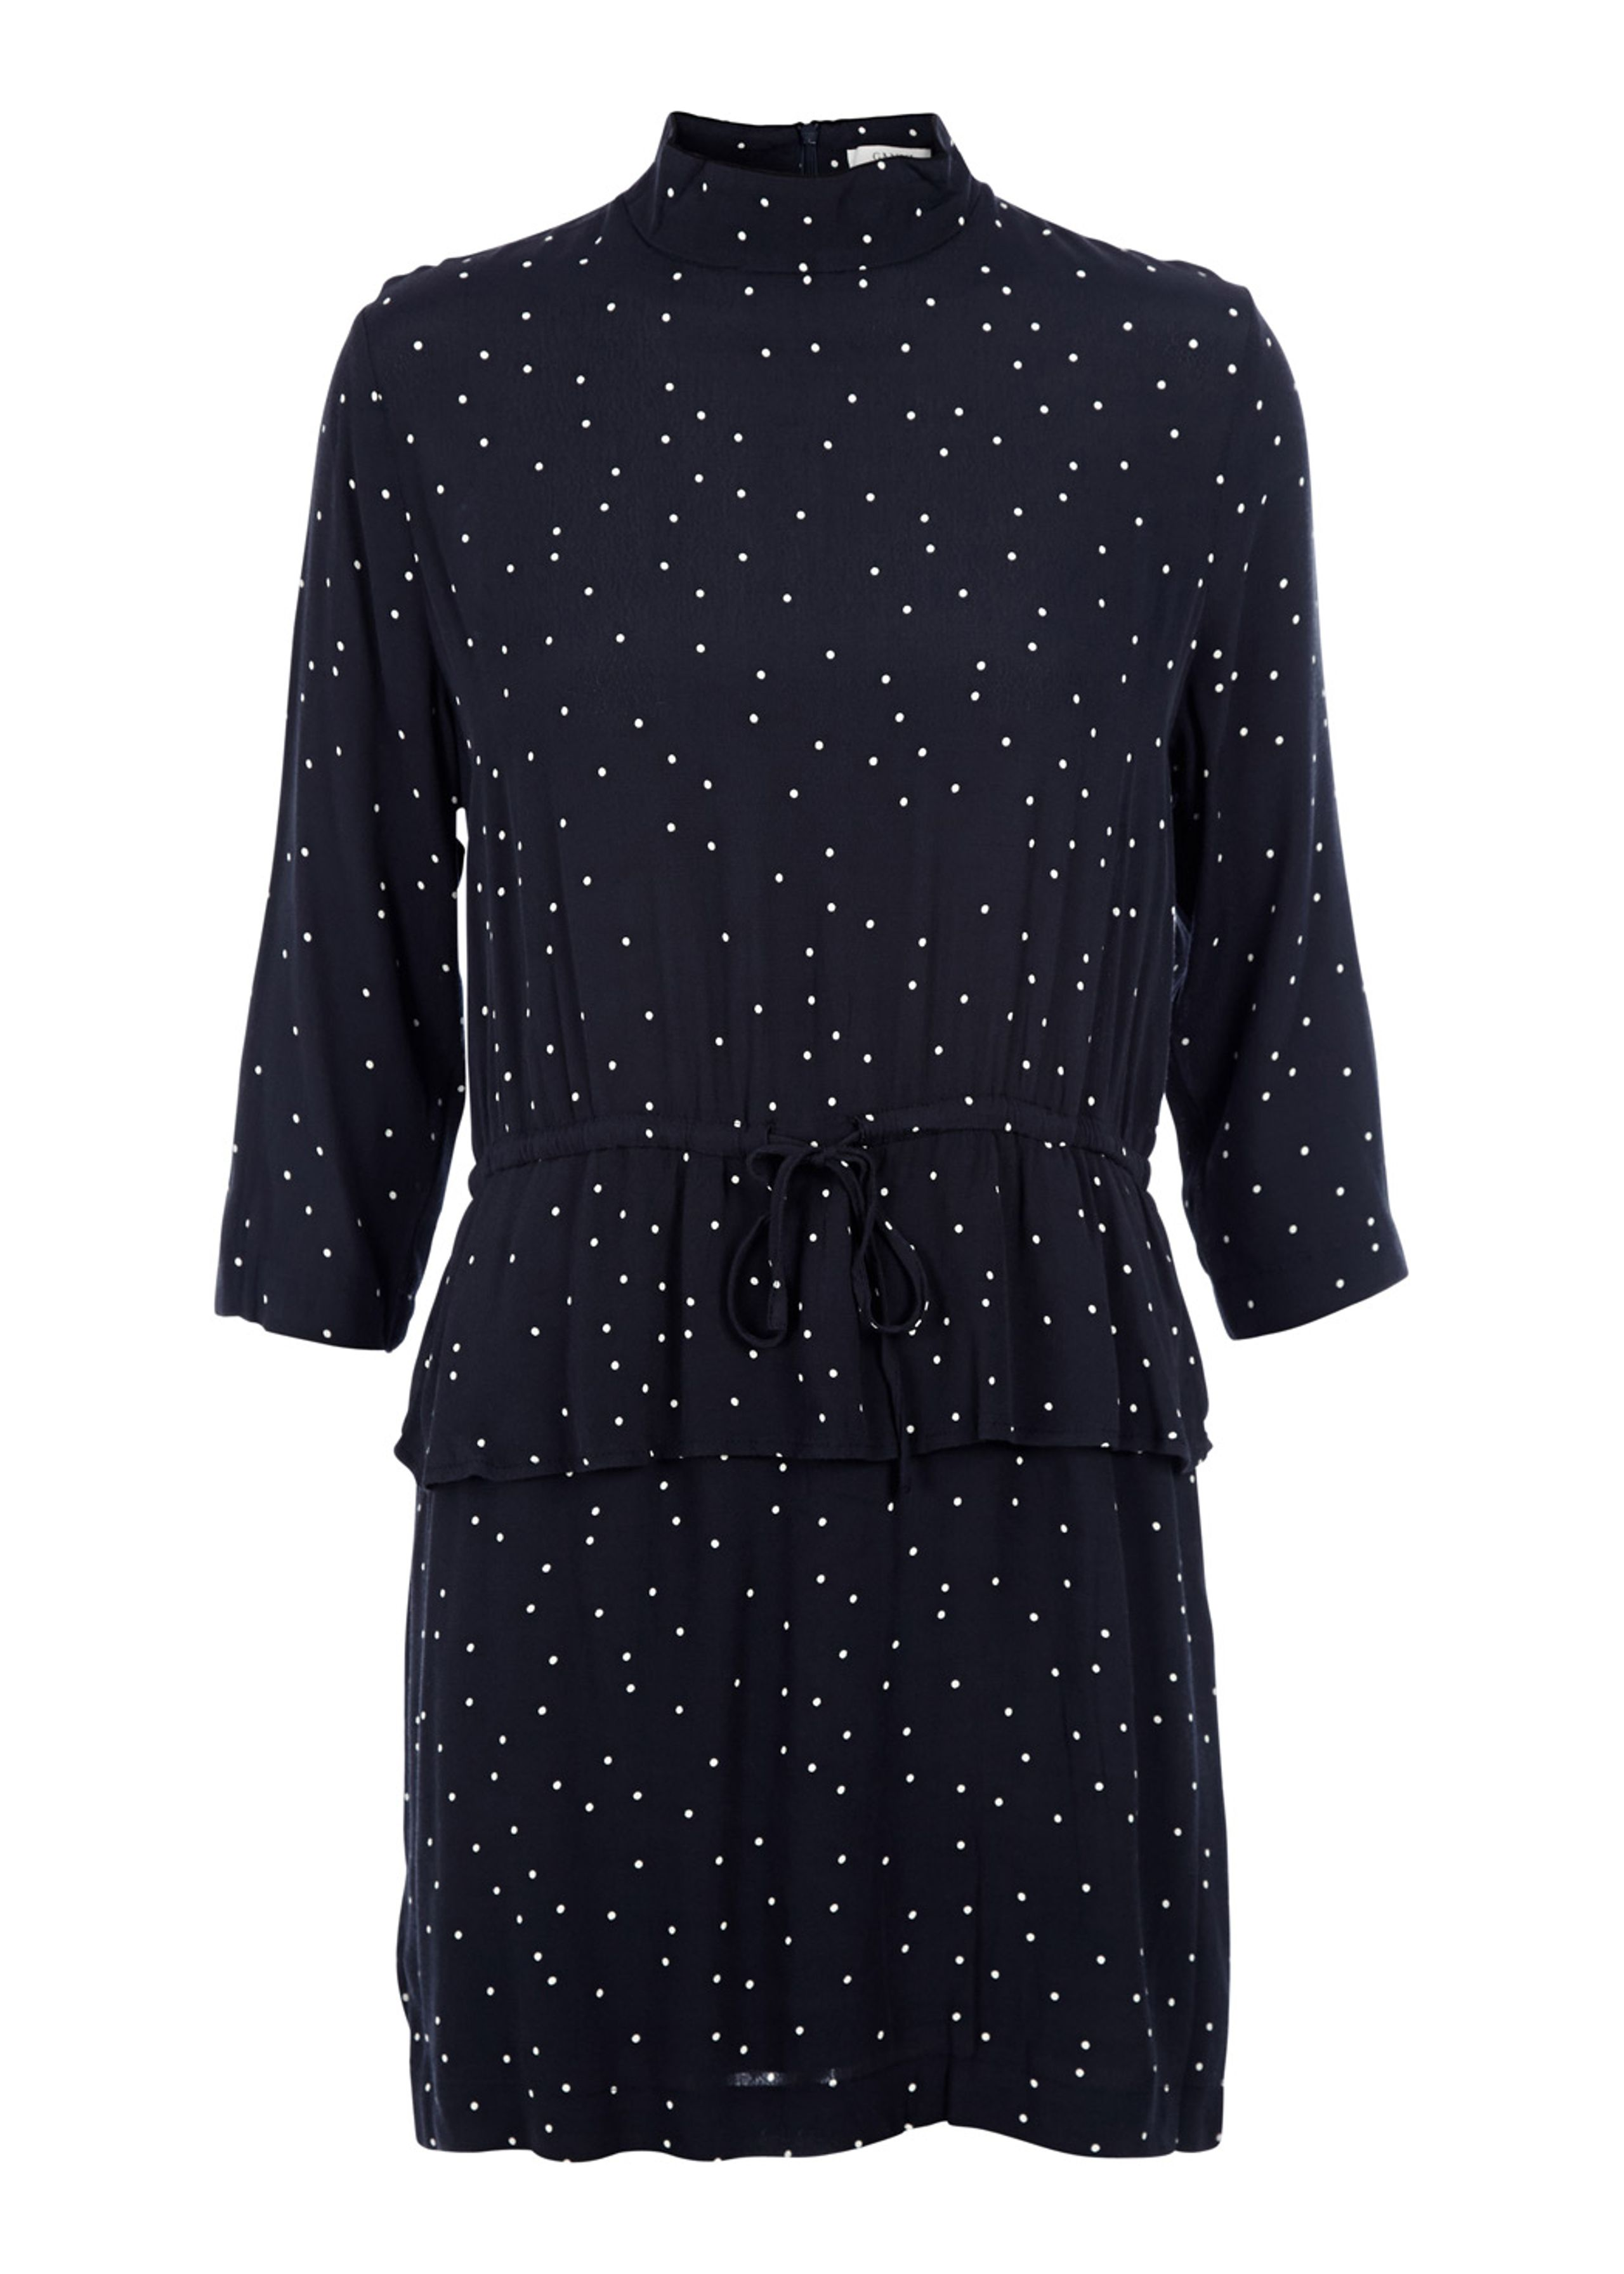 Rosemont dress